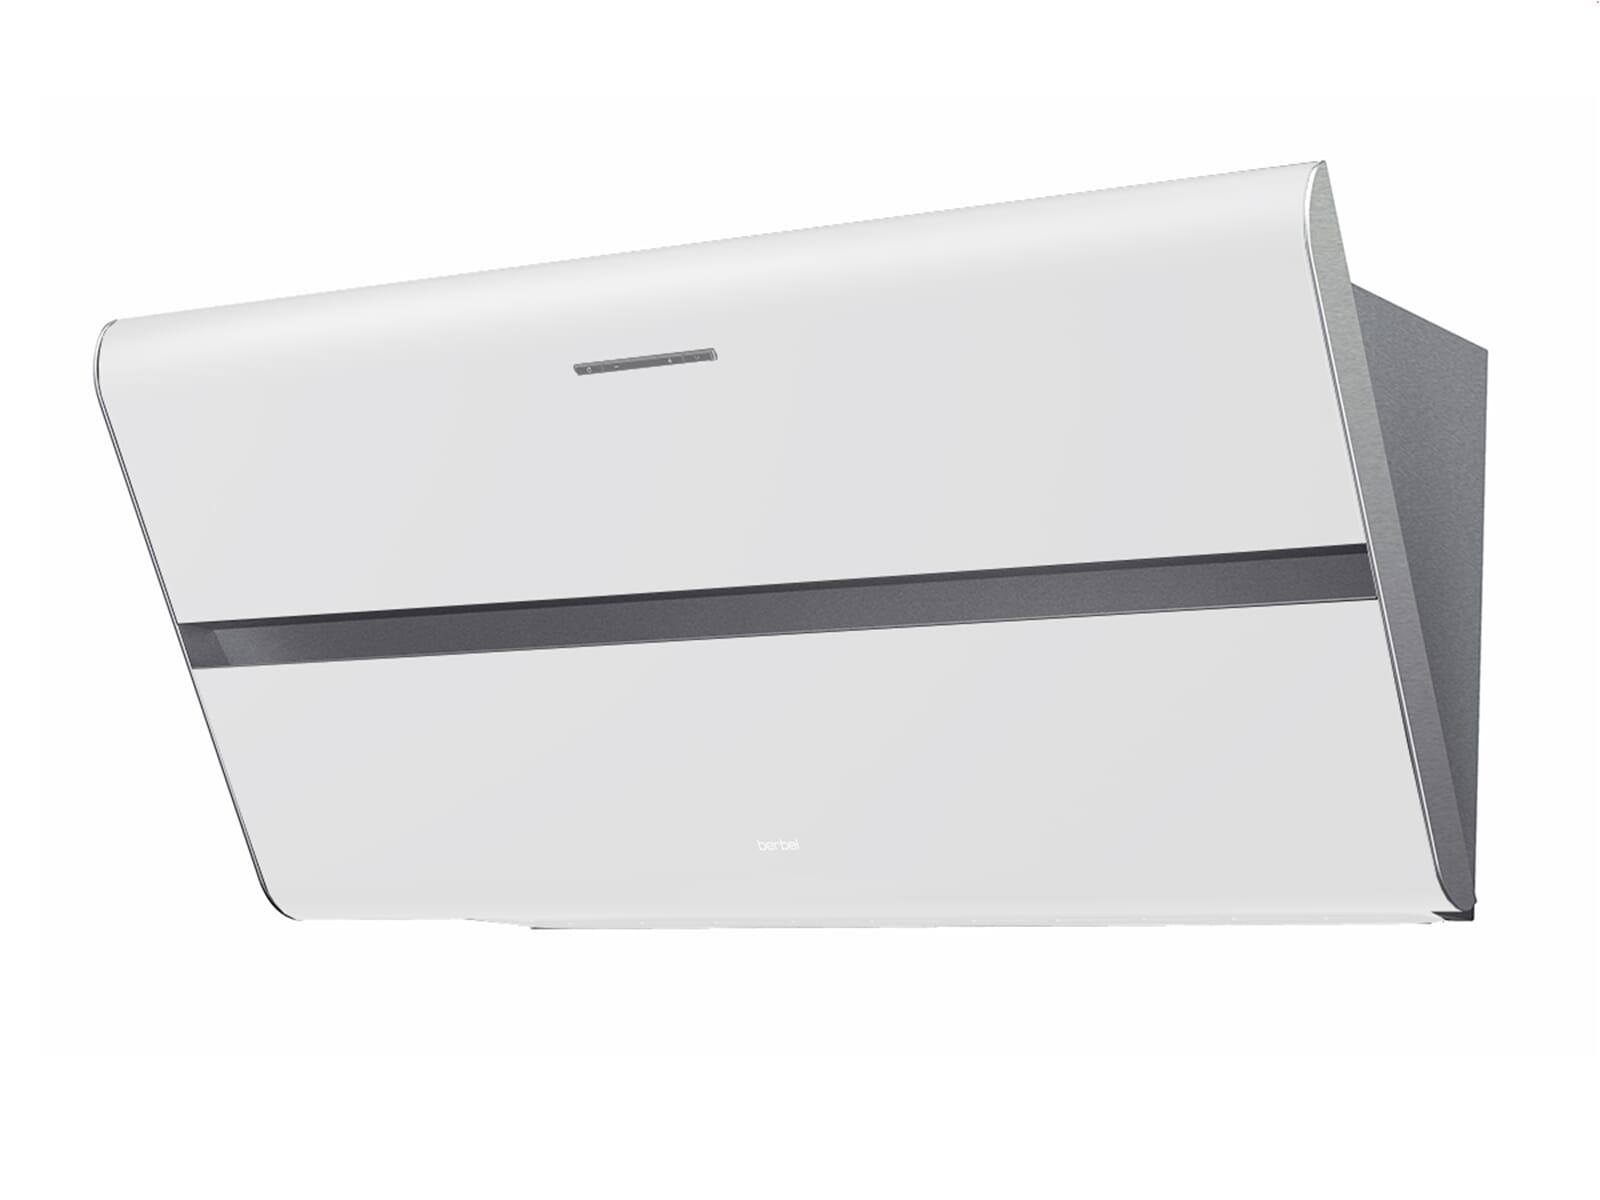 Berbel Smartline BKH 80 ST W P Kopffreihaube Weiß